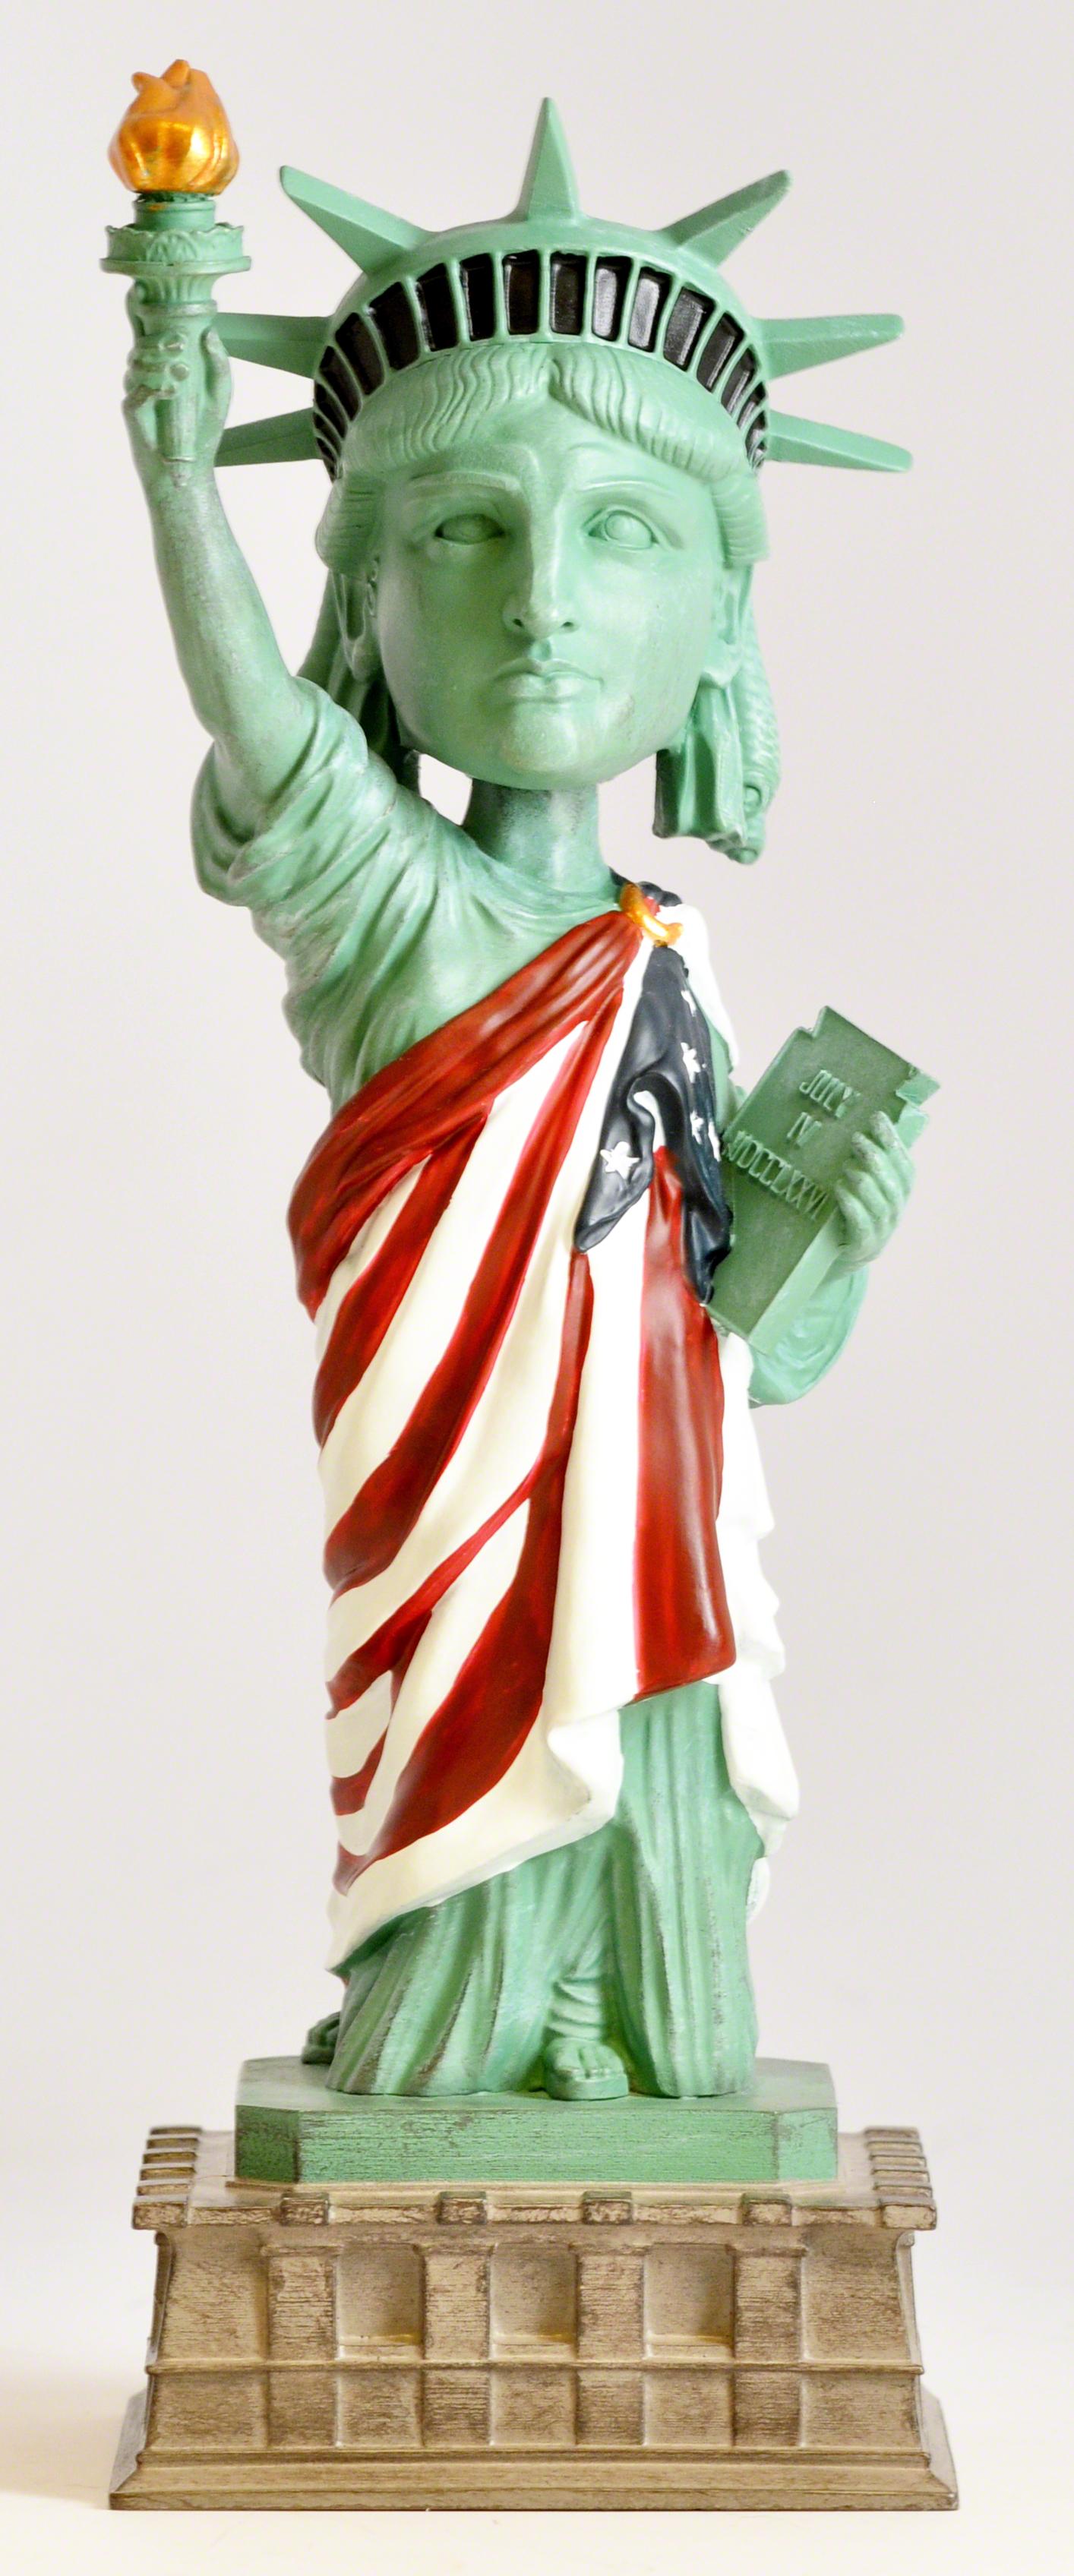 Statue_of_Liberty_Exclusive_Version2-DWM